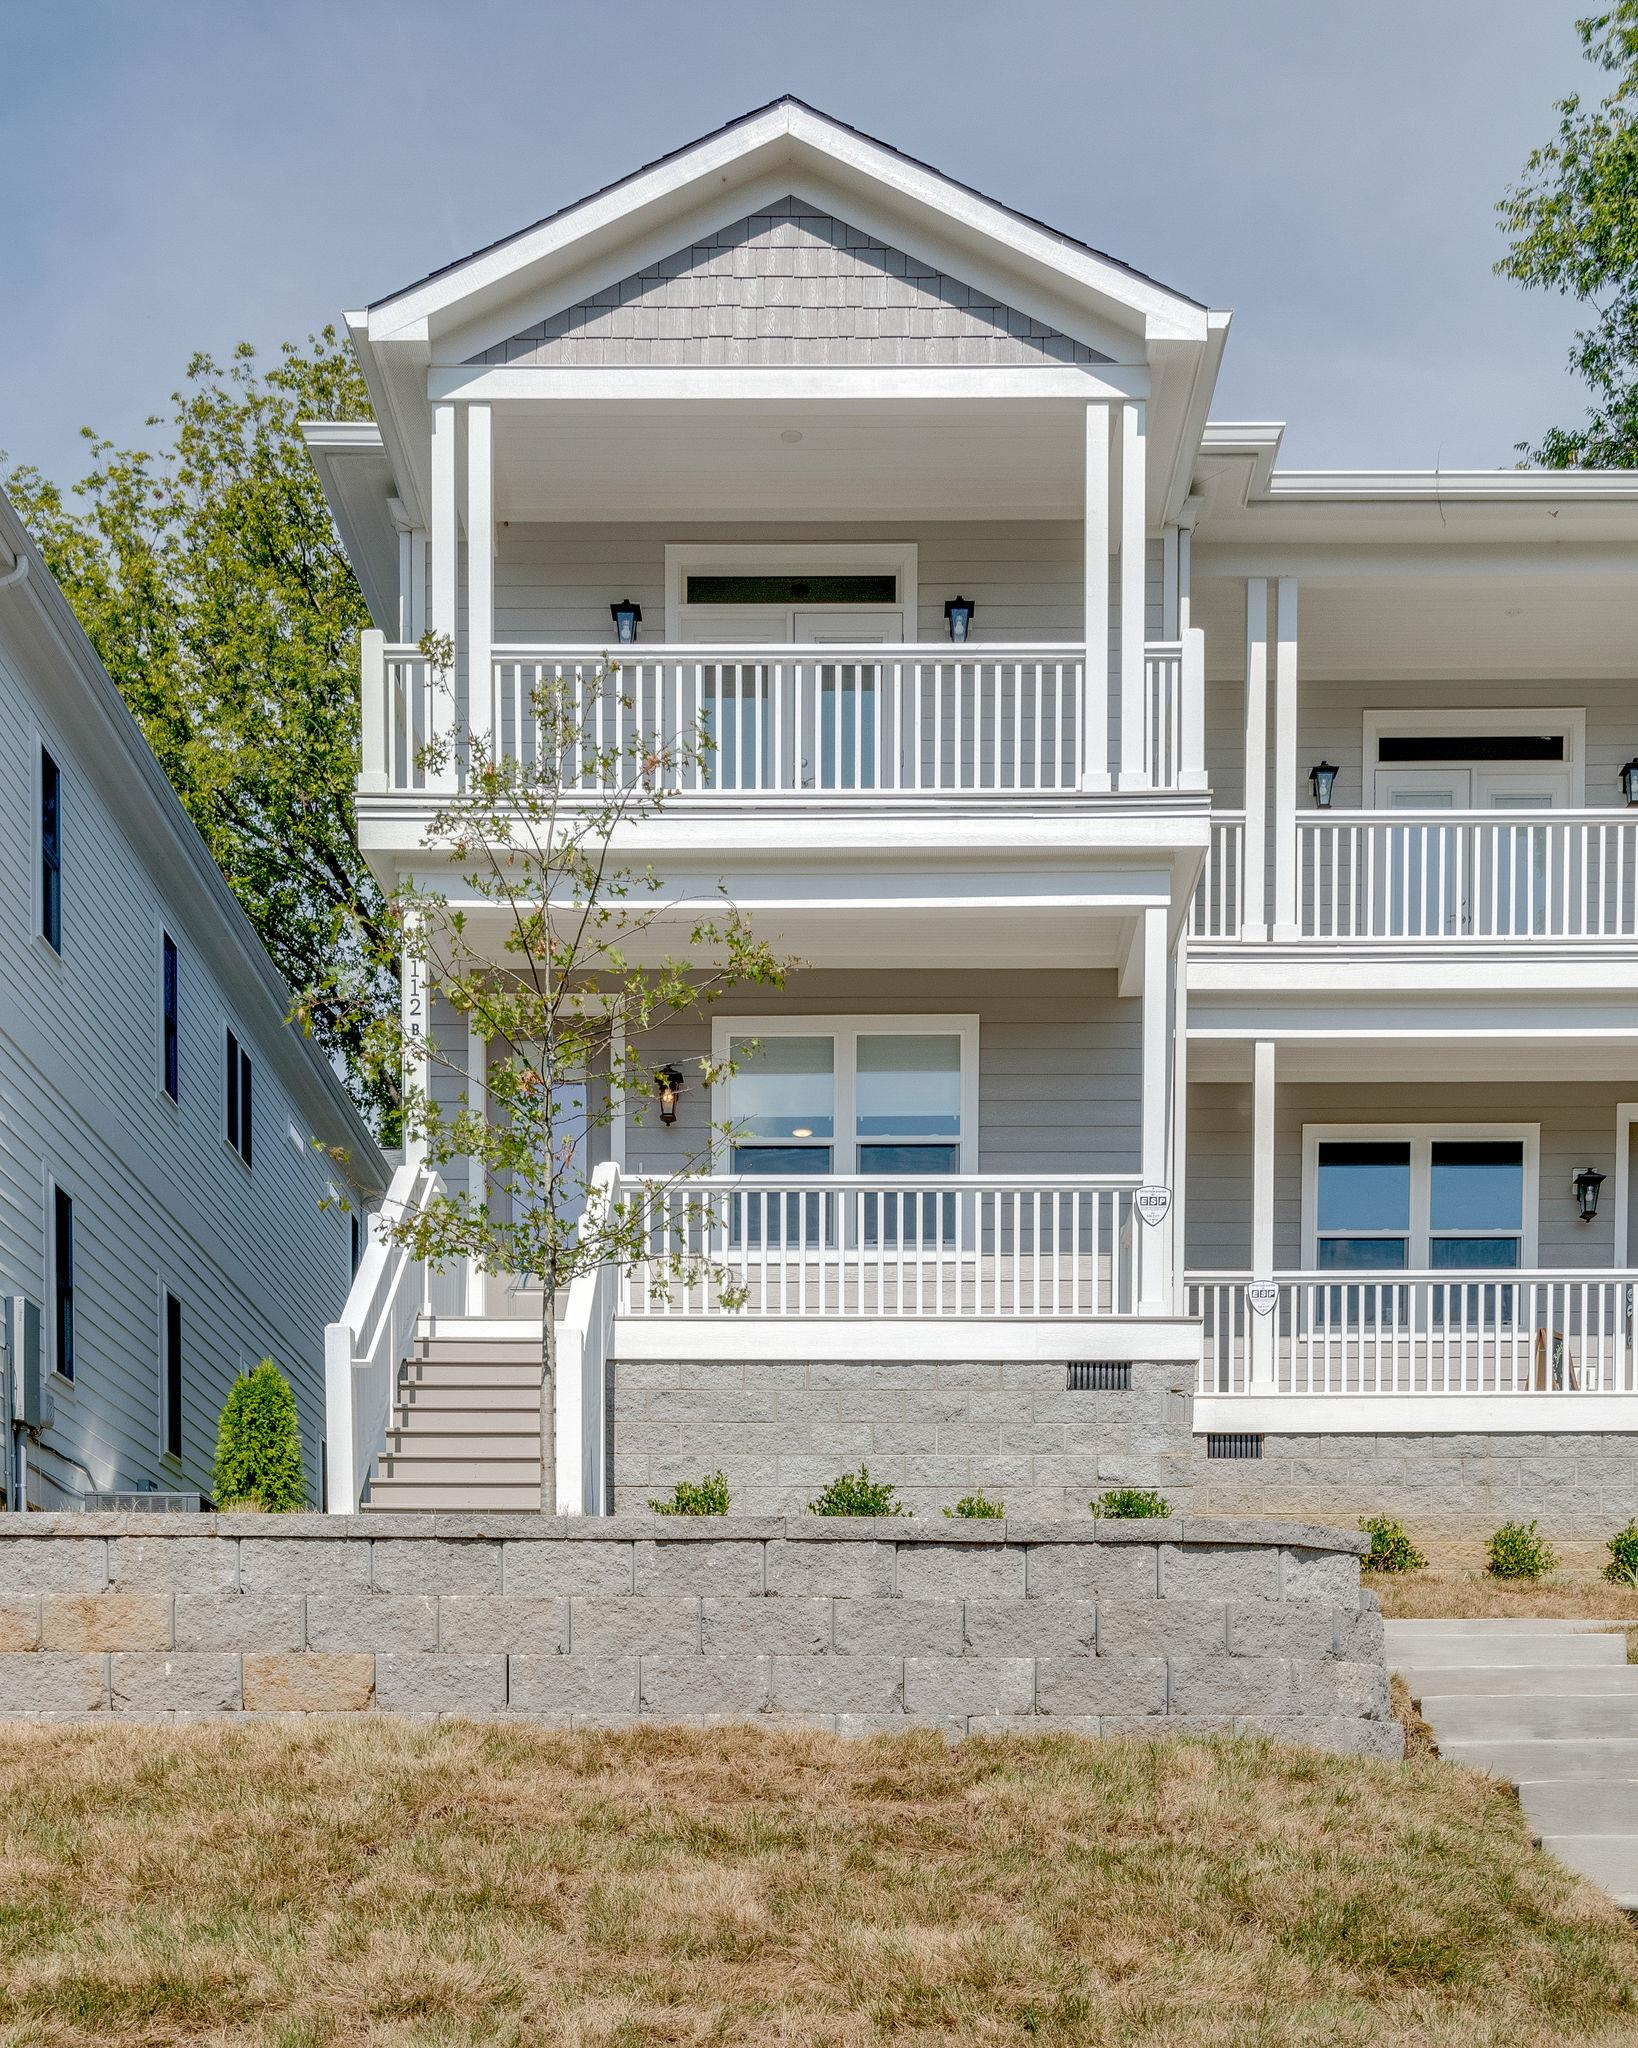 2112B 11Th Ave N, Nashville, TN 37208 - Nashville, TN real estate listing